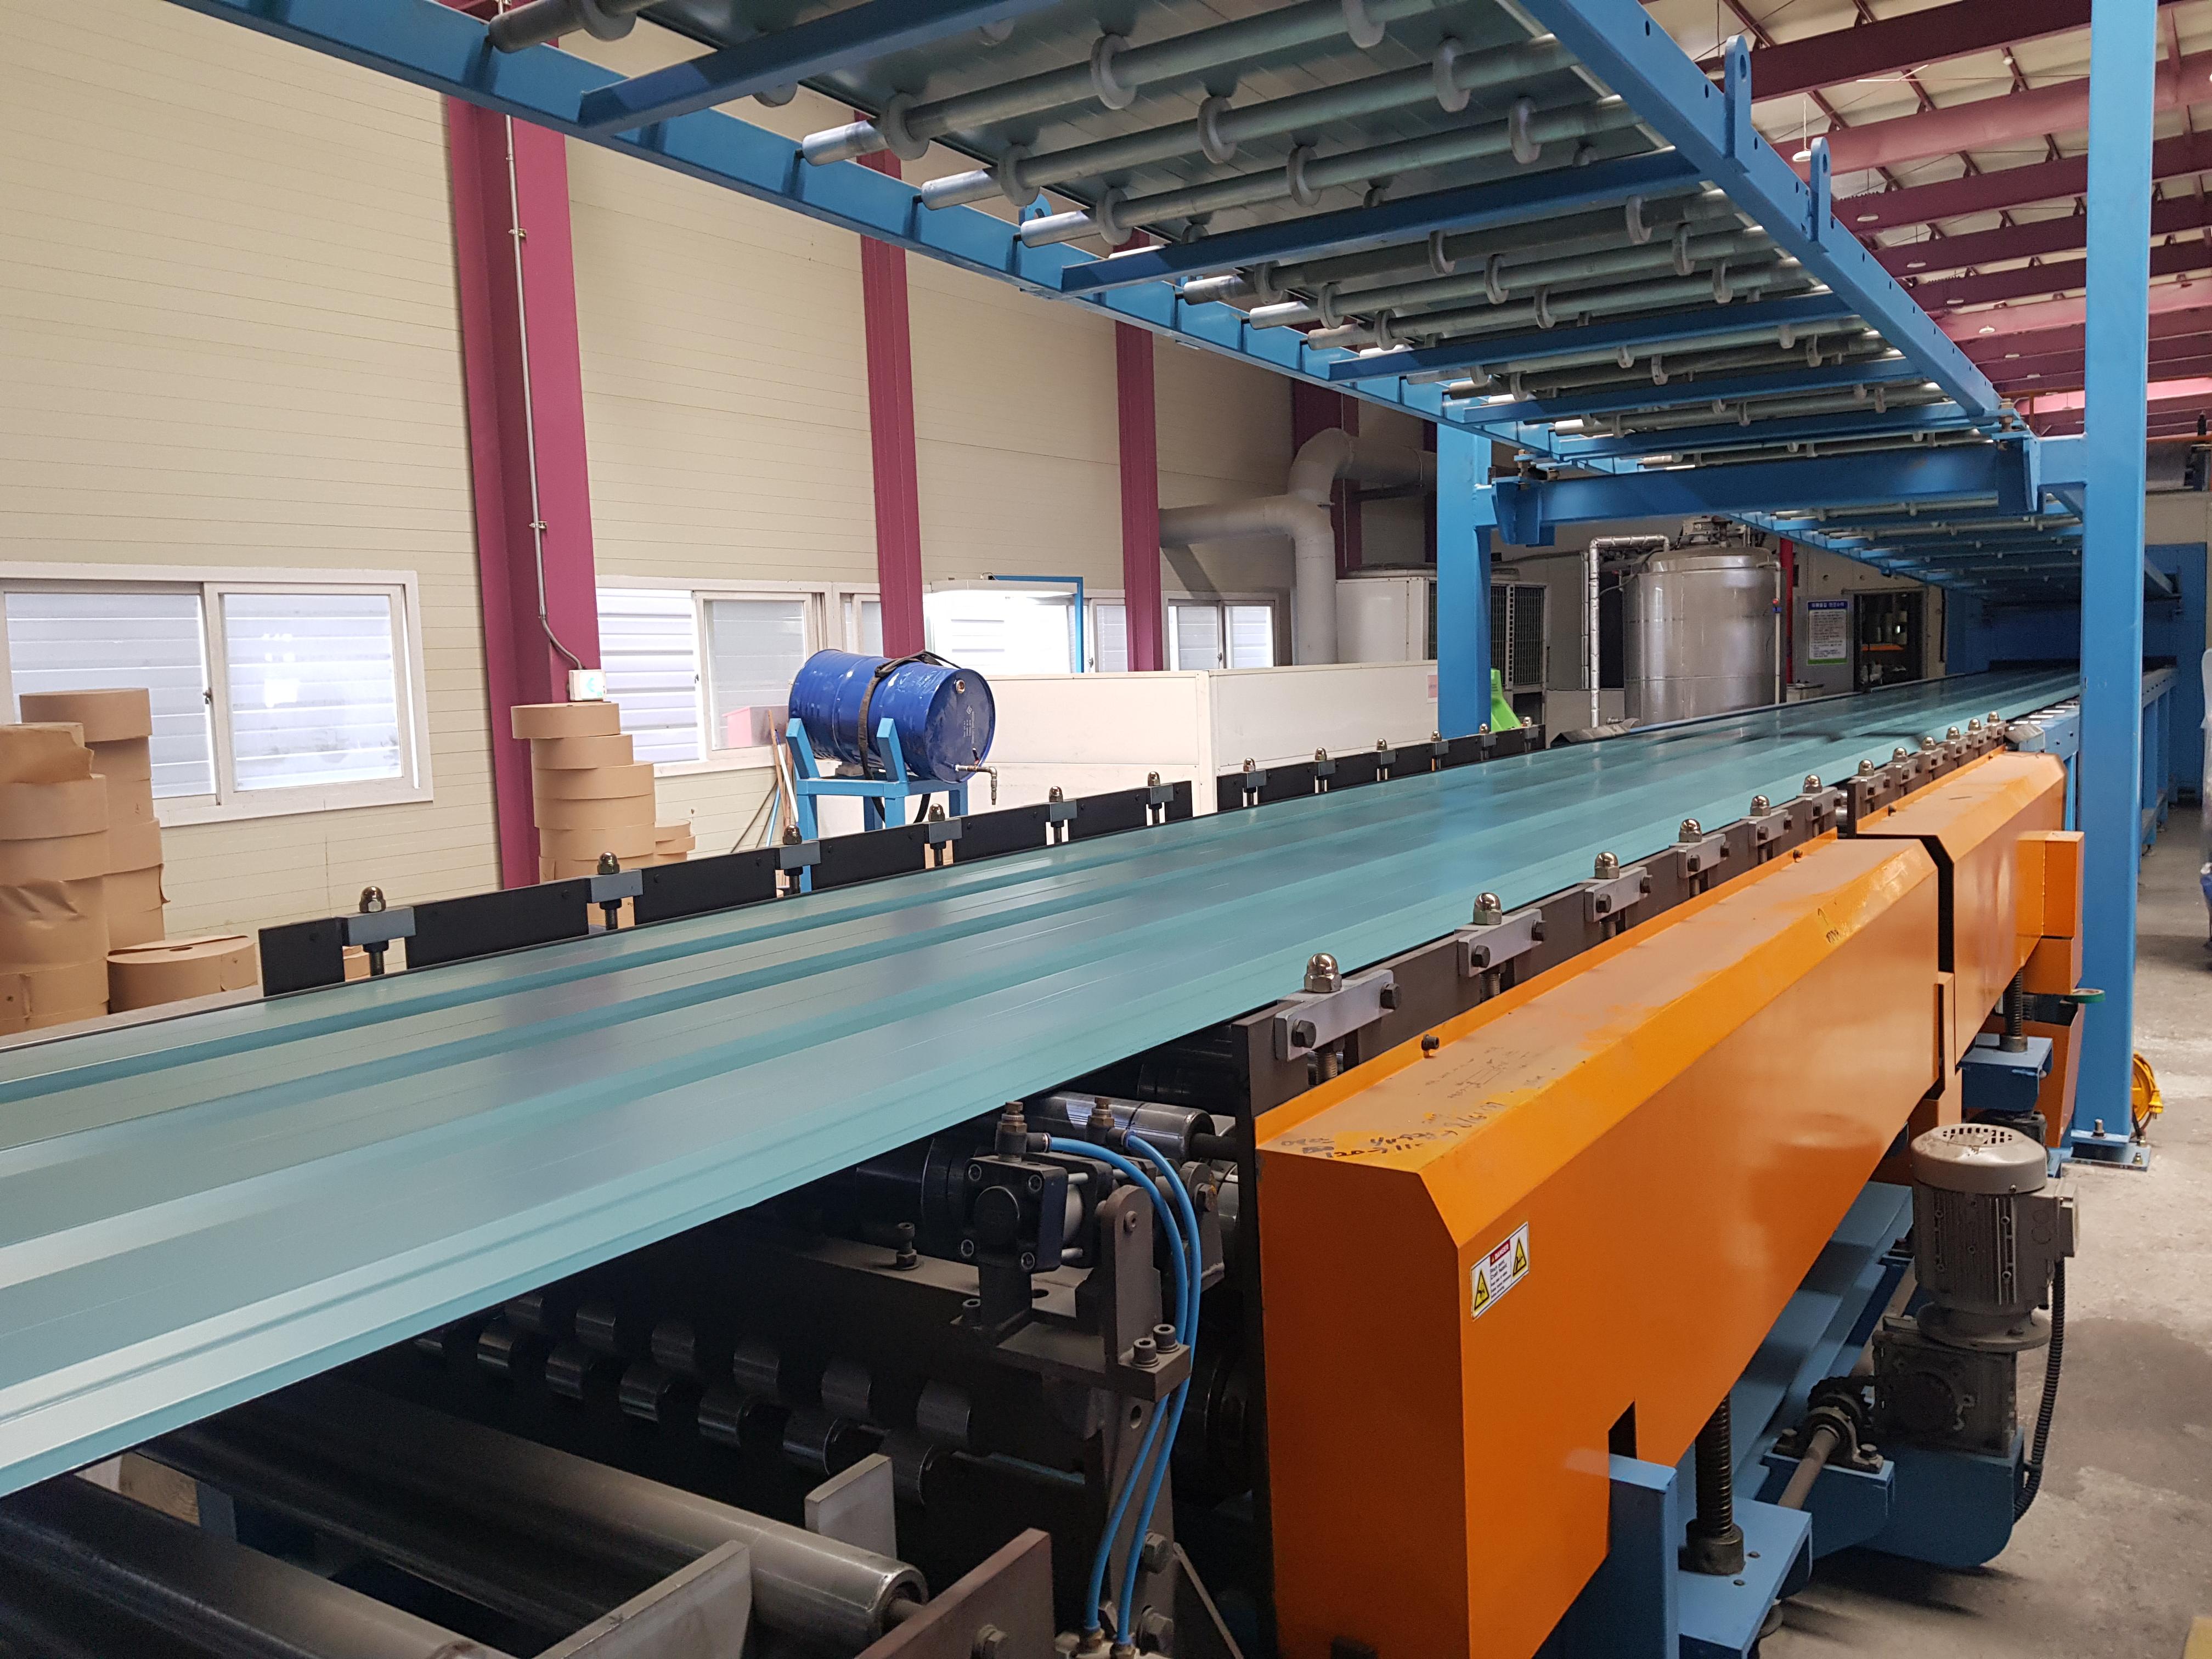 22m PIR sandwich panel manufacturer